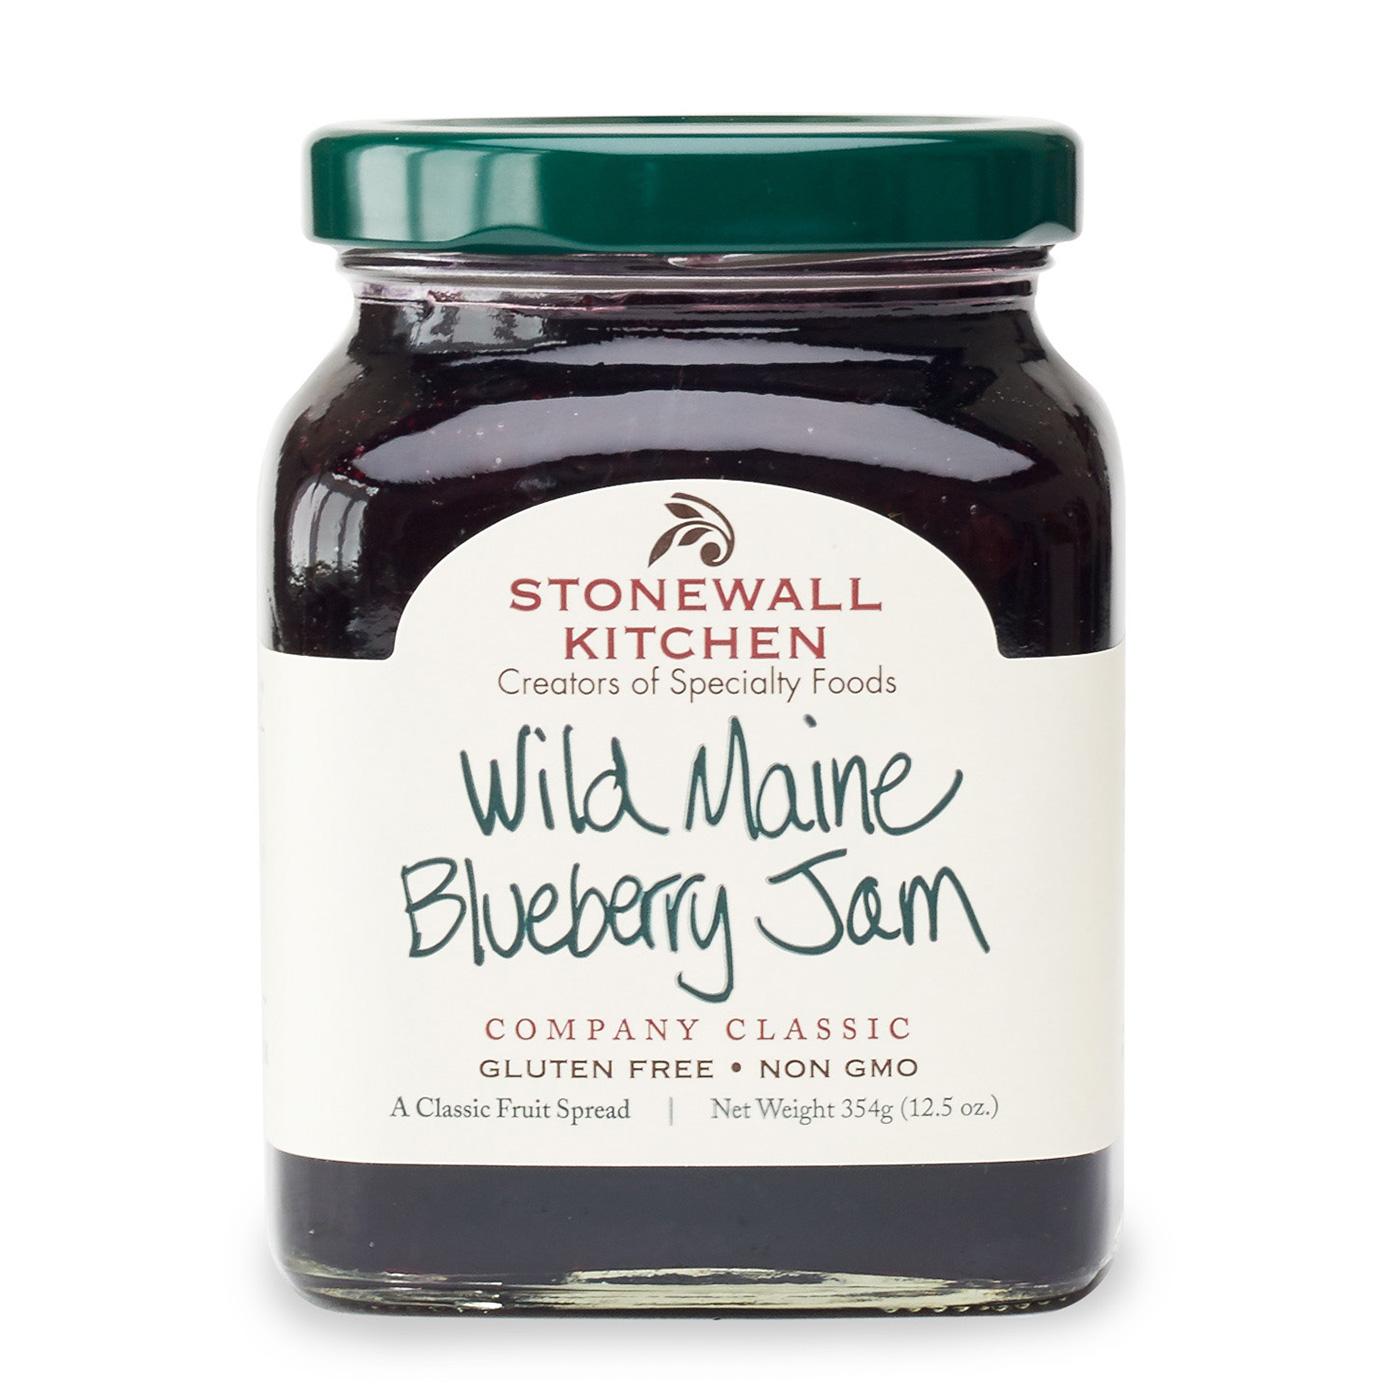 Wild Maine Blueberry Jam  Jams Preserves  Spreads